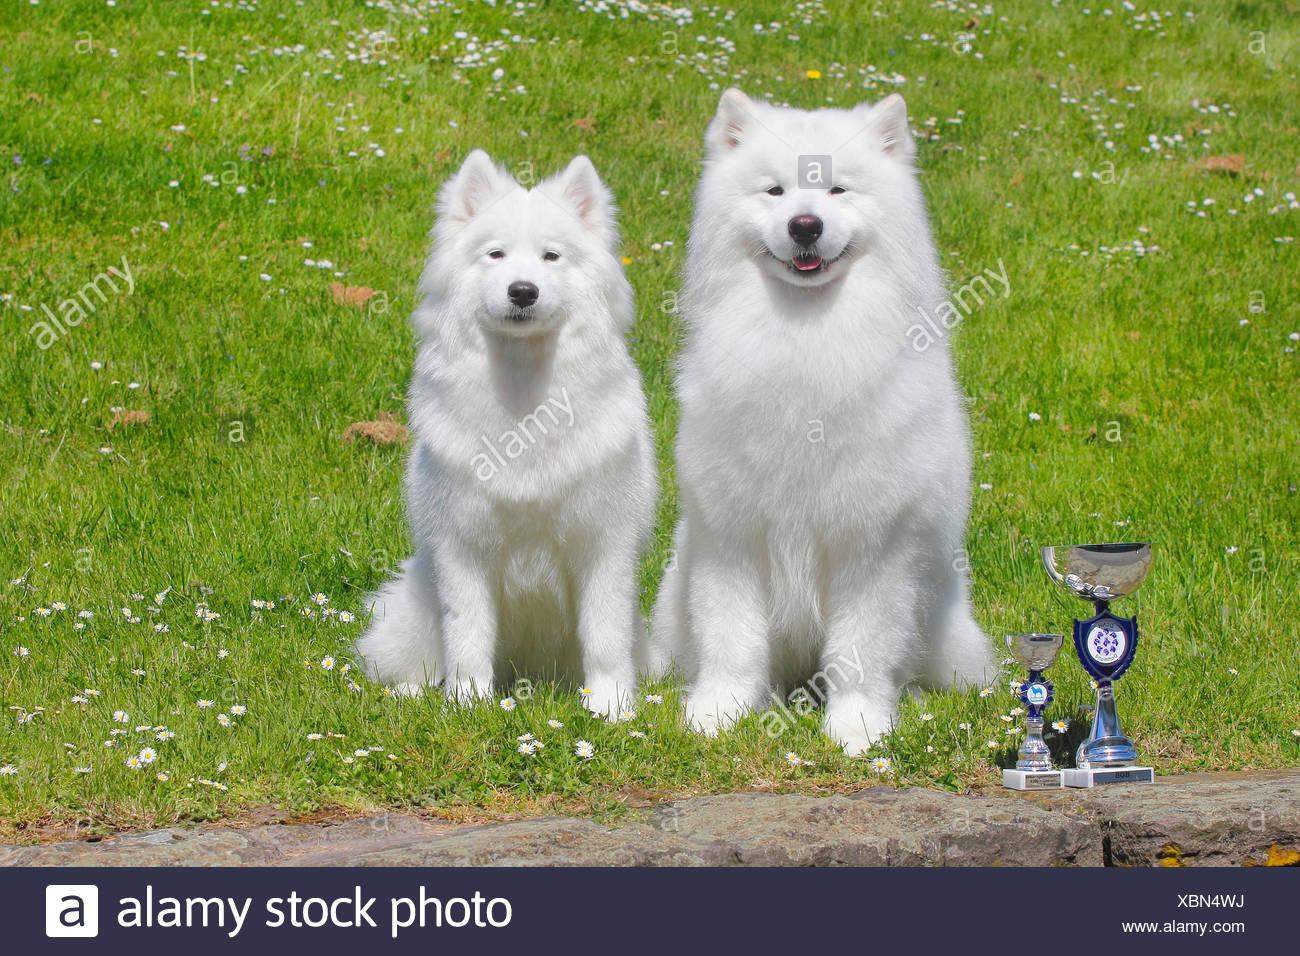 Samojede, Samojeden, Samoiedskaïa Sabaka (Canis Lupus F. Familiaris), Zwei Samojeden Nebeneinander Auf der Wiese Mit Einem Pokal v Stockbild